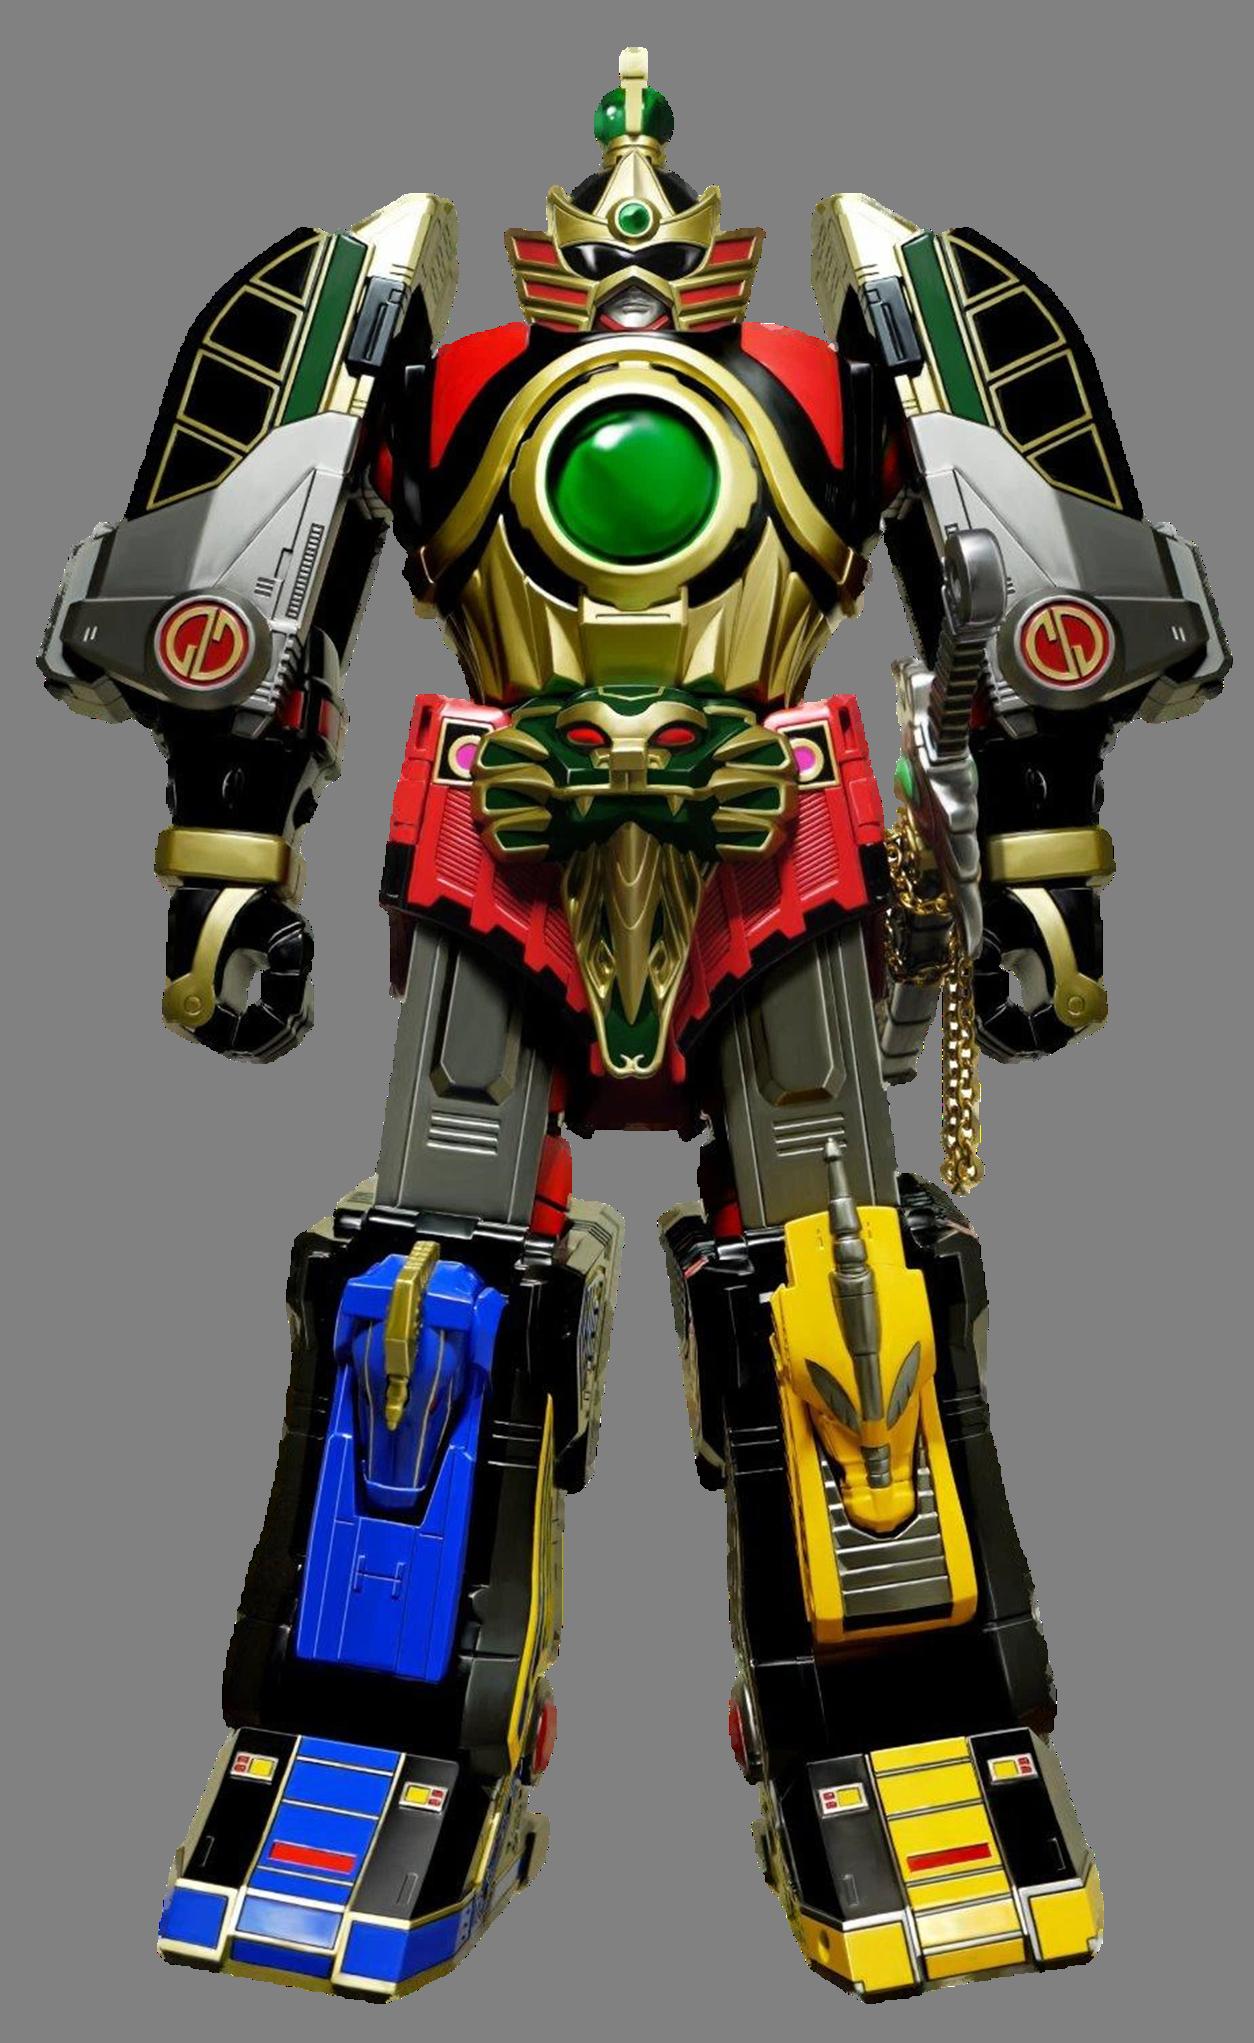 Image - Legacy Thunder Megazord.png | RangerWiki | FANDOM ...